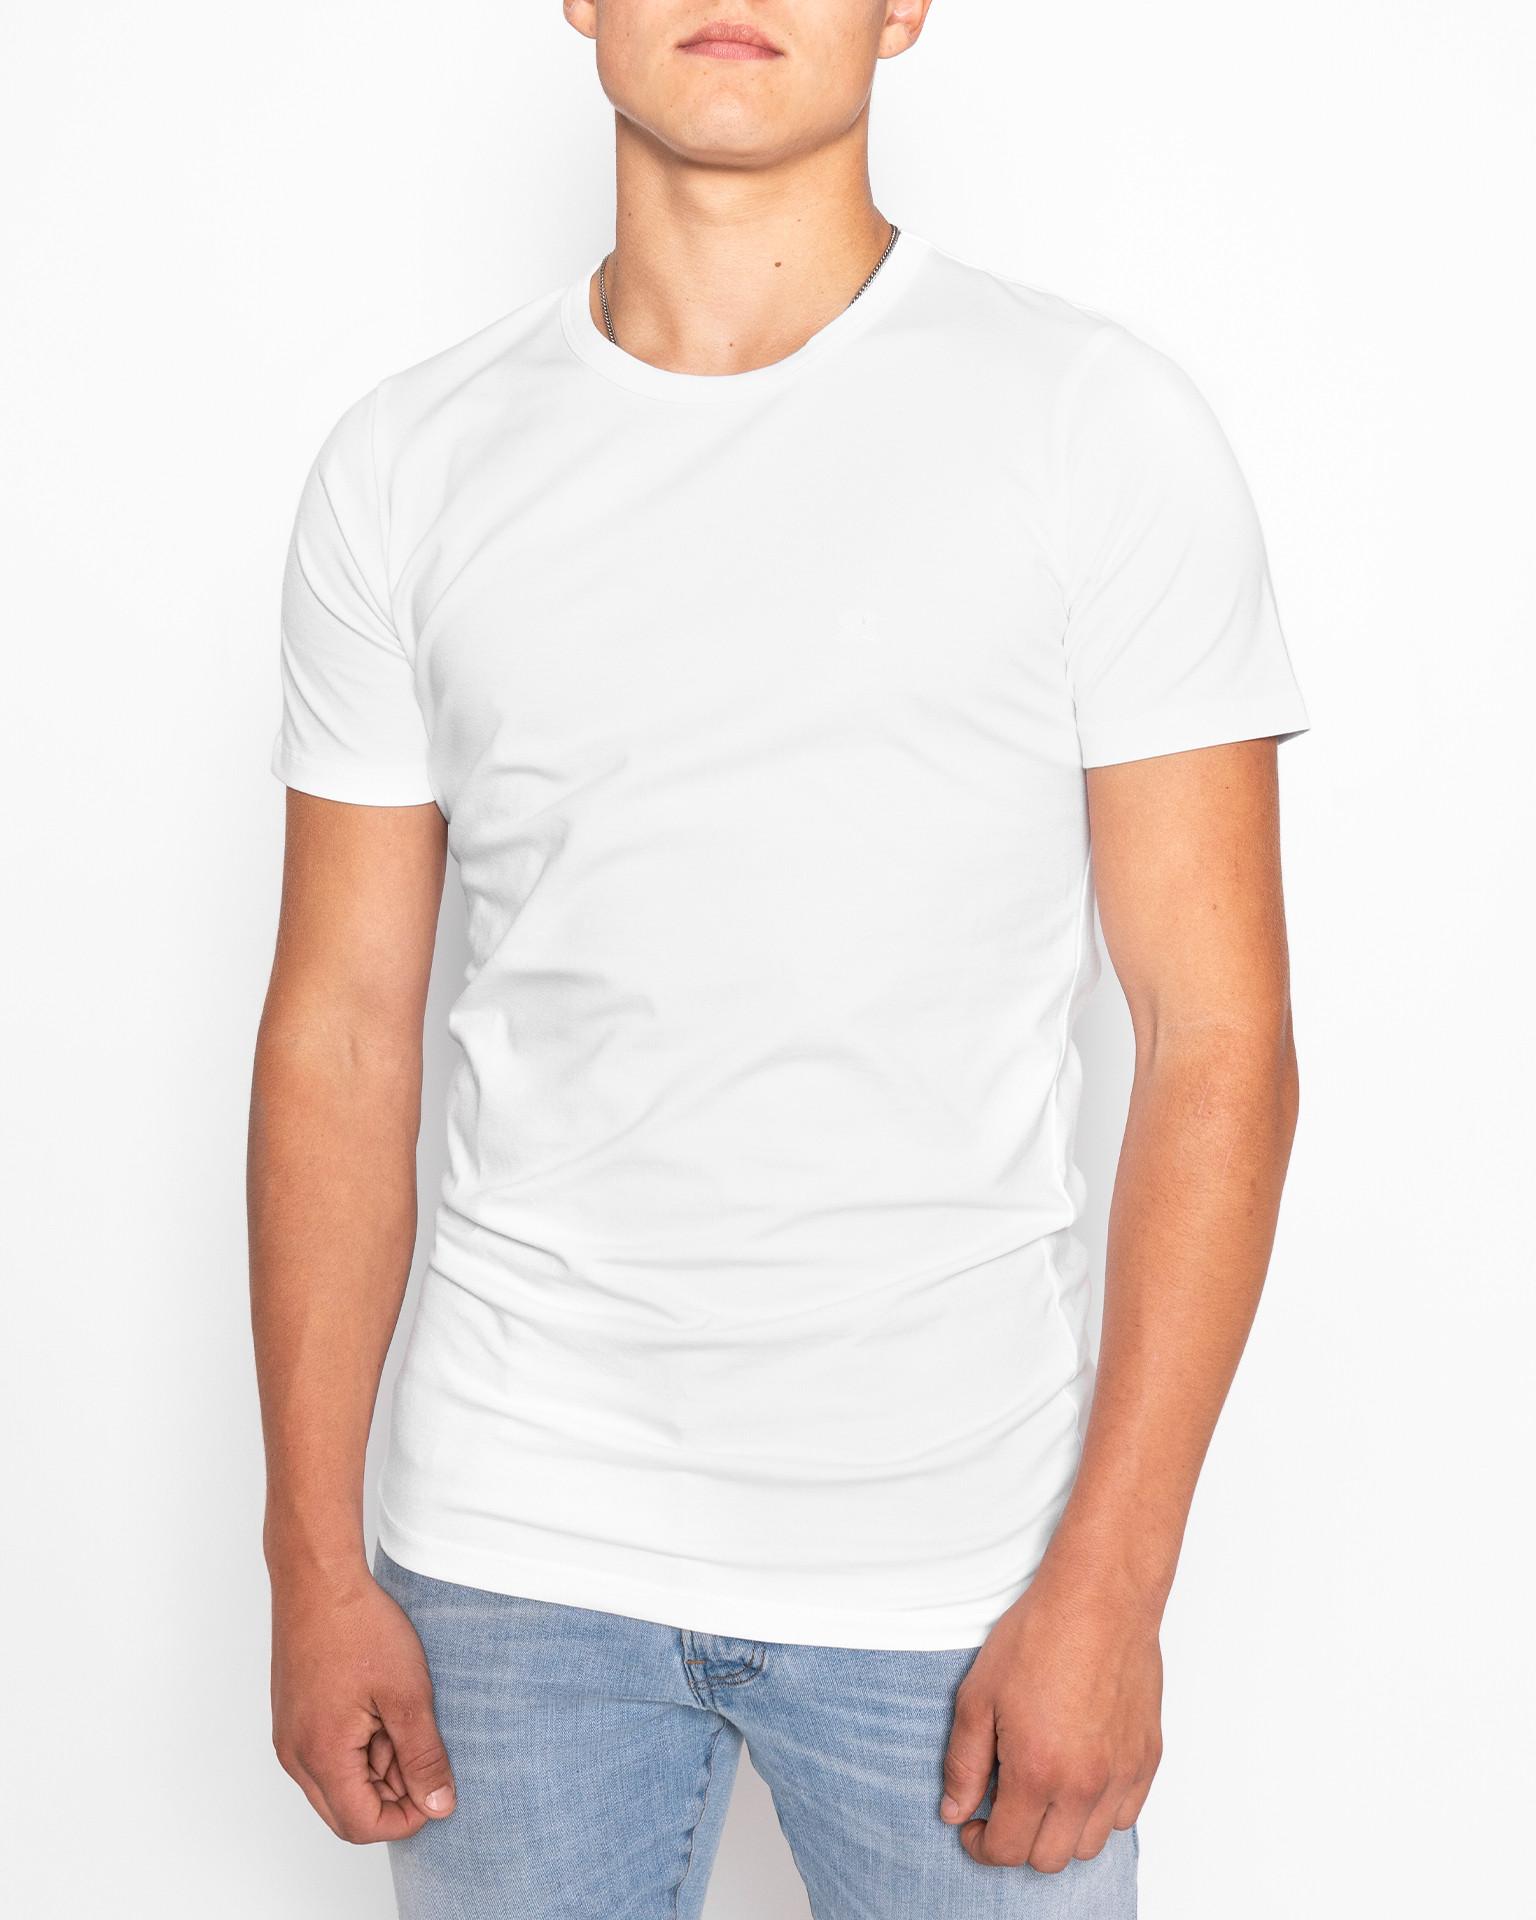 T-Shirt | Basic Slim | Weiss